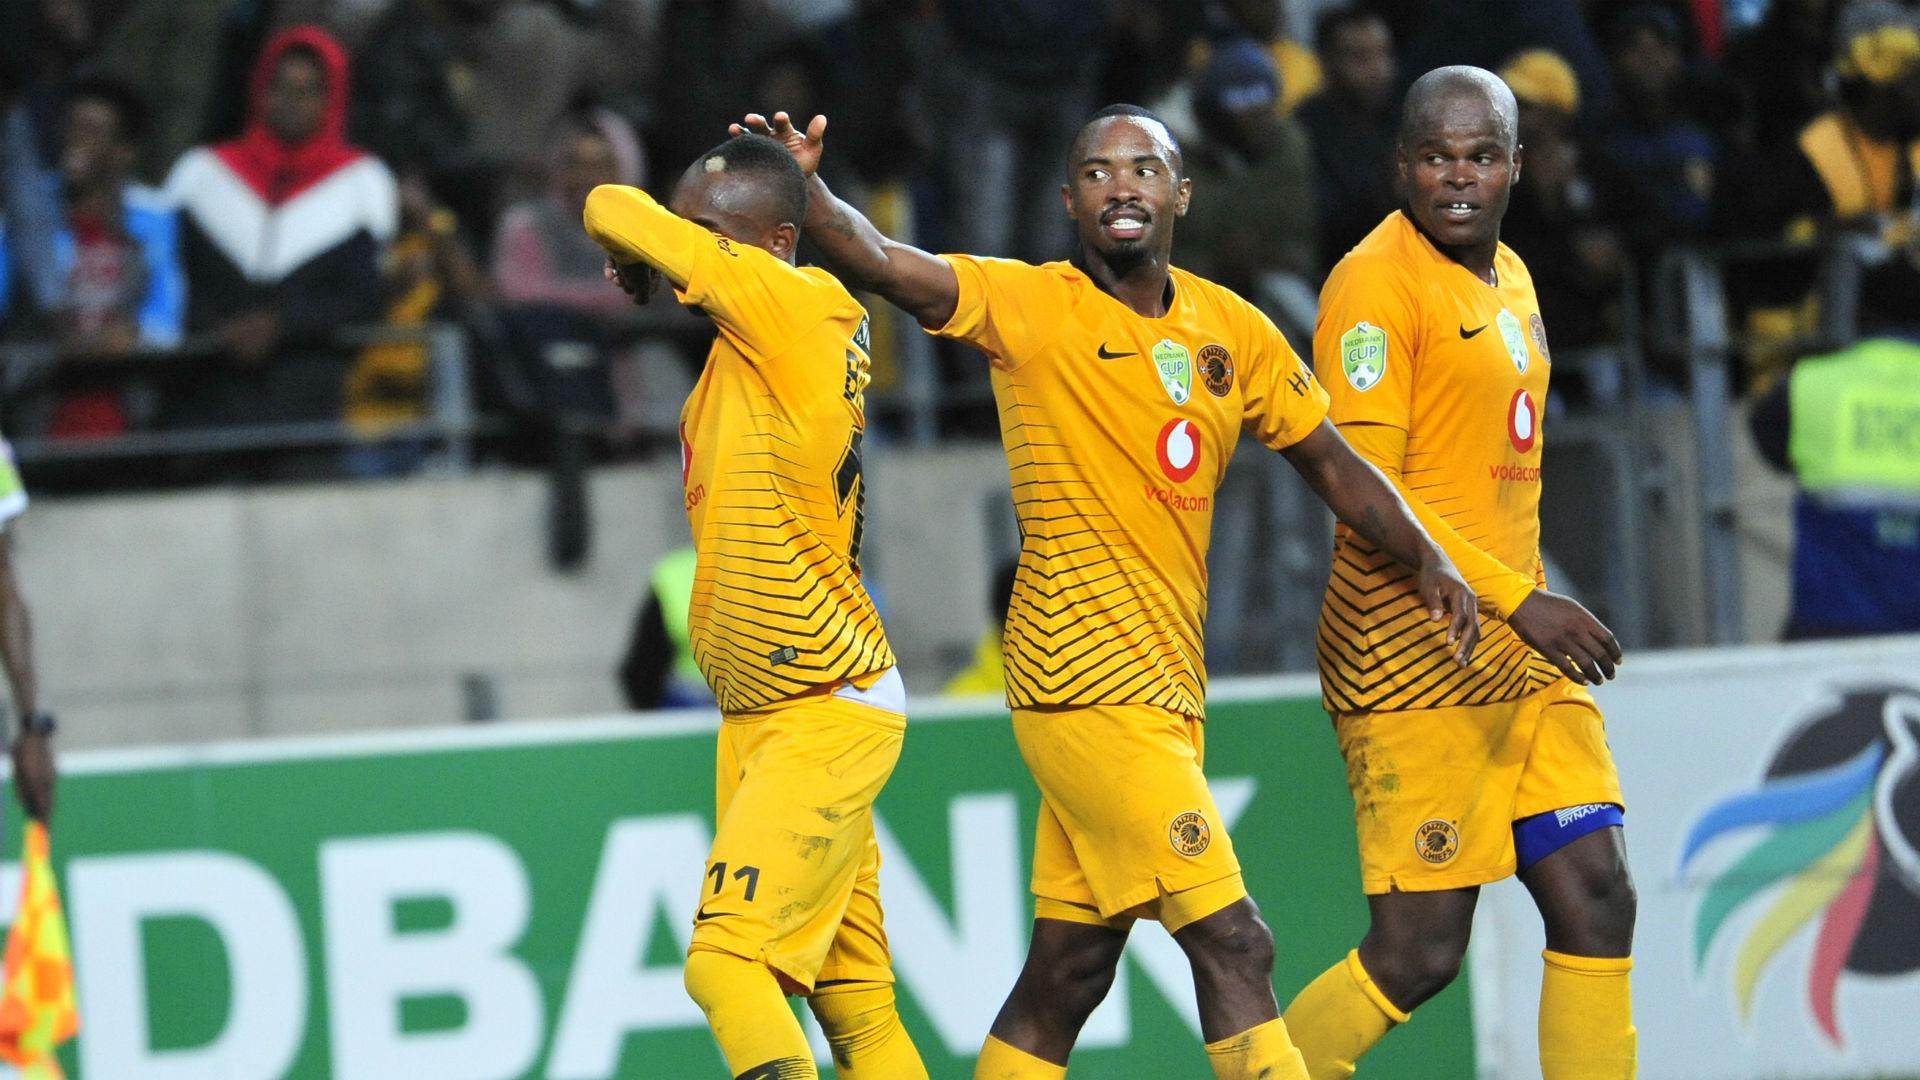 Chippa United v Kaizer Chiefs, April 2019